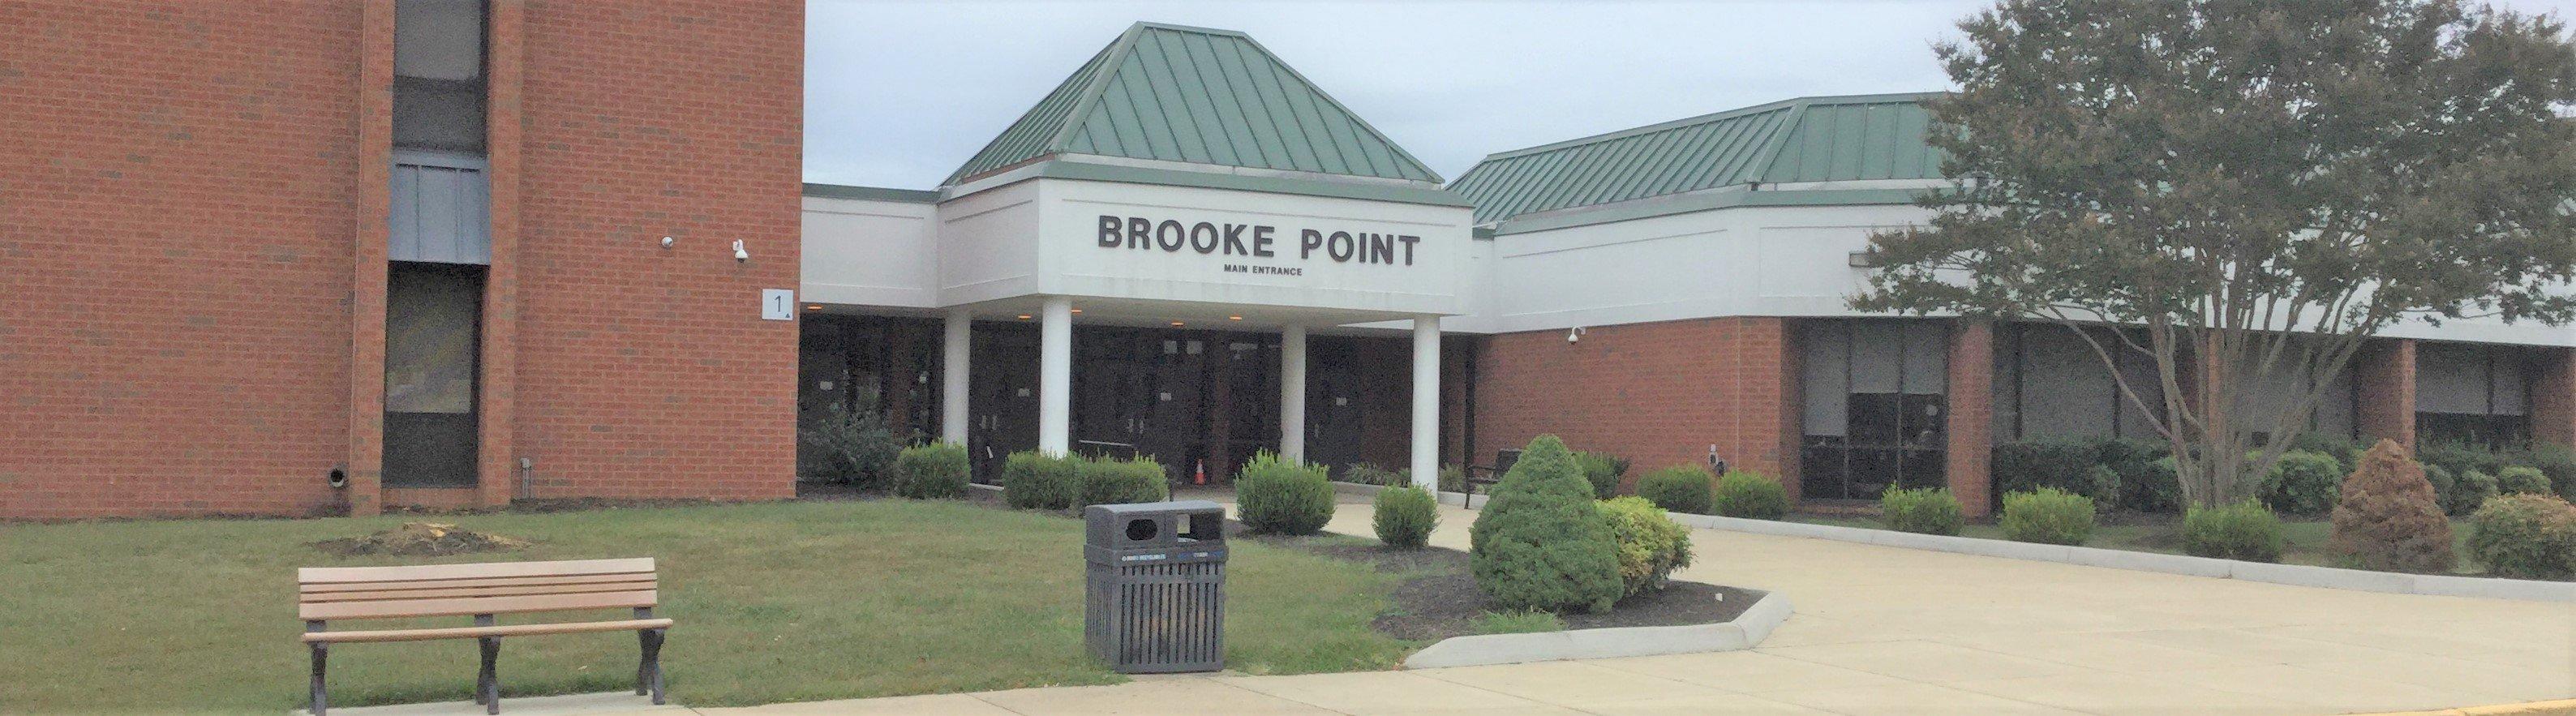 Brooke Point